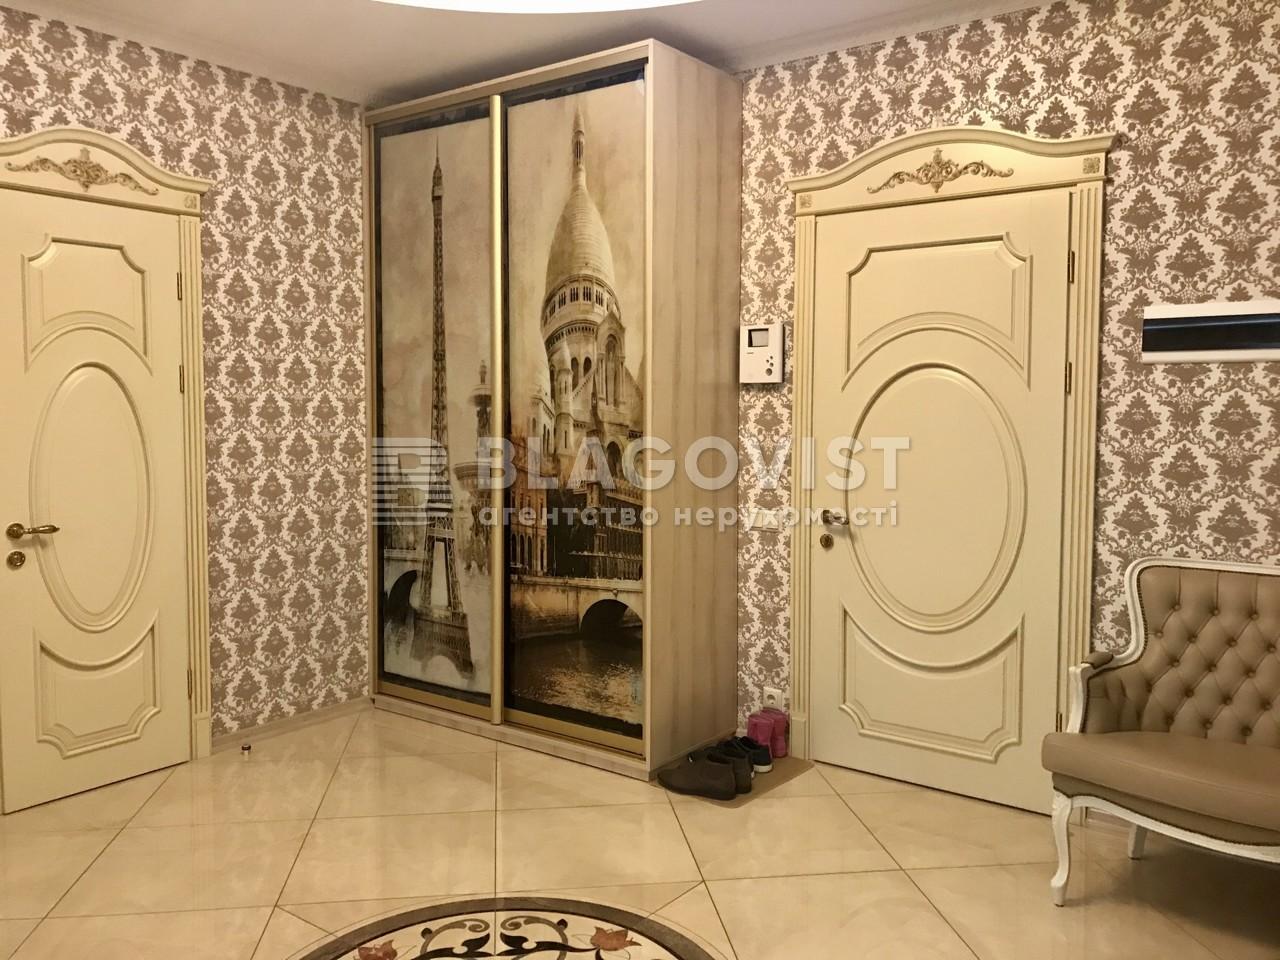 Квартира F-42604, Мельникова, 18б, Киев - Фото 24